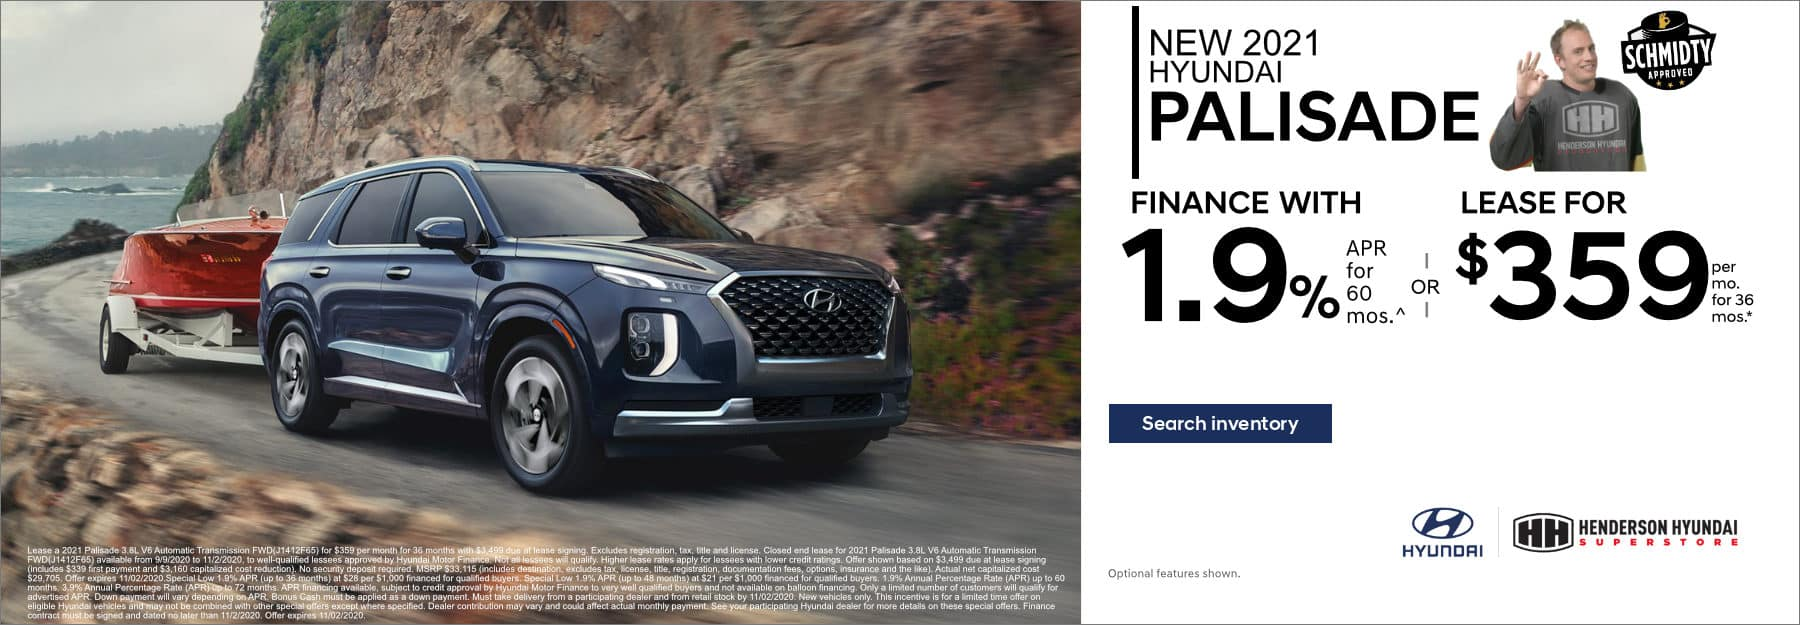 RR_October-2020_2021_PALISADE_Henderson_Hyundai_1400x514